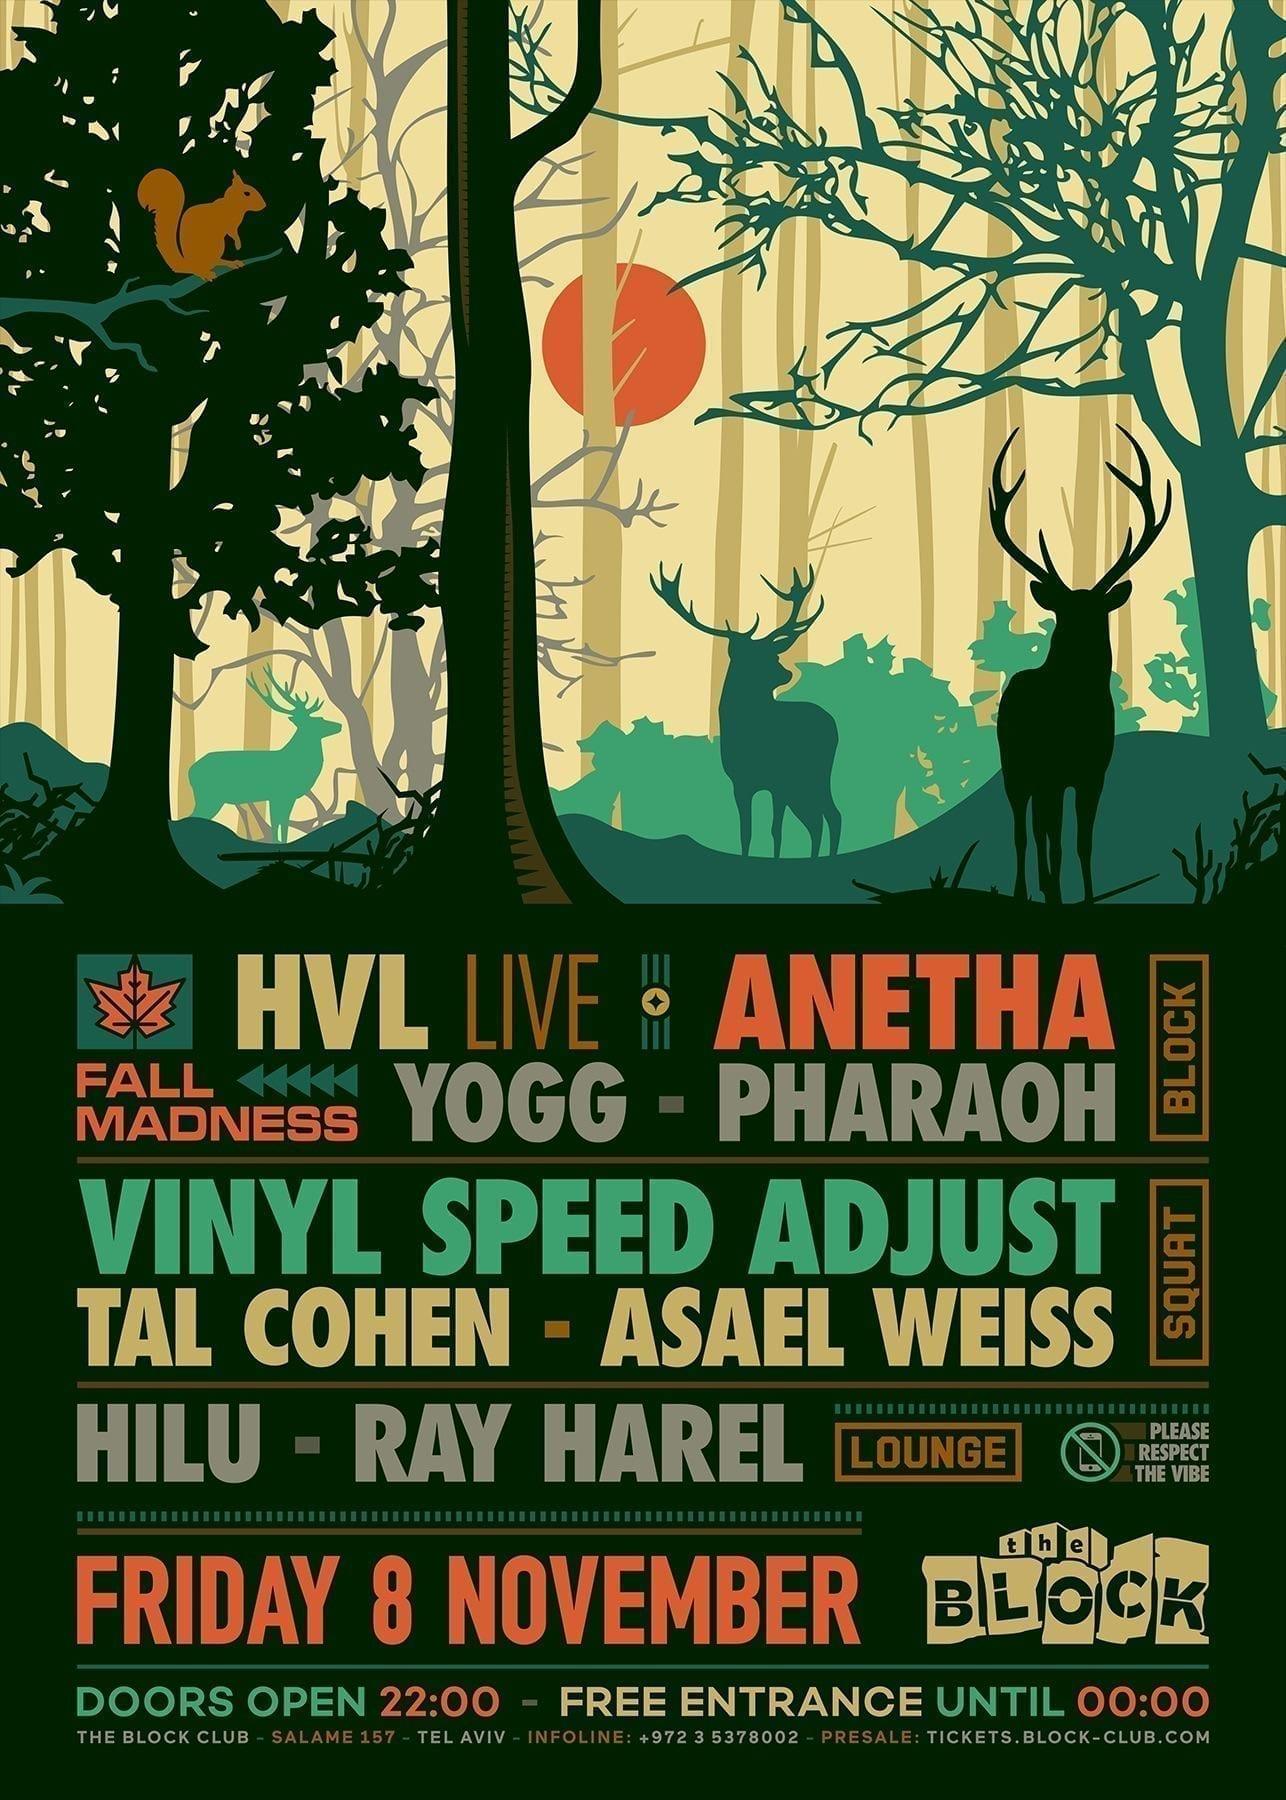 Block Fall Madness Anetha, HVL Live, Vinyl Speed Adjust